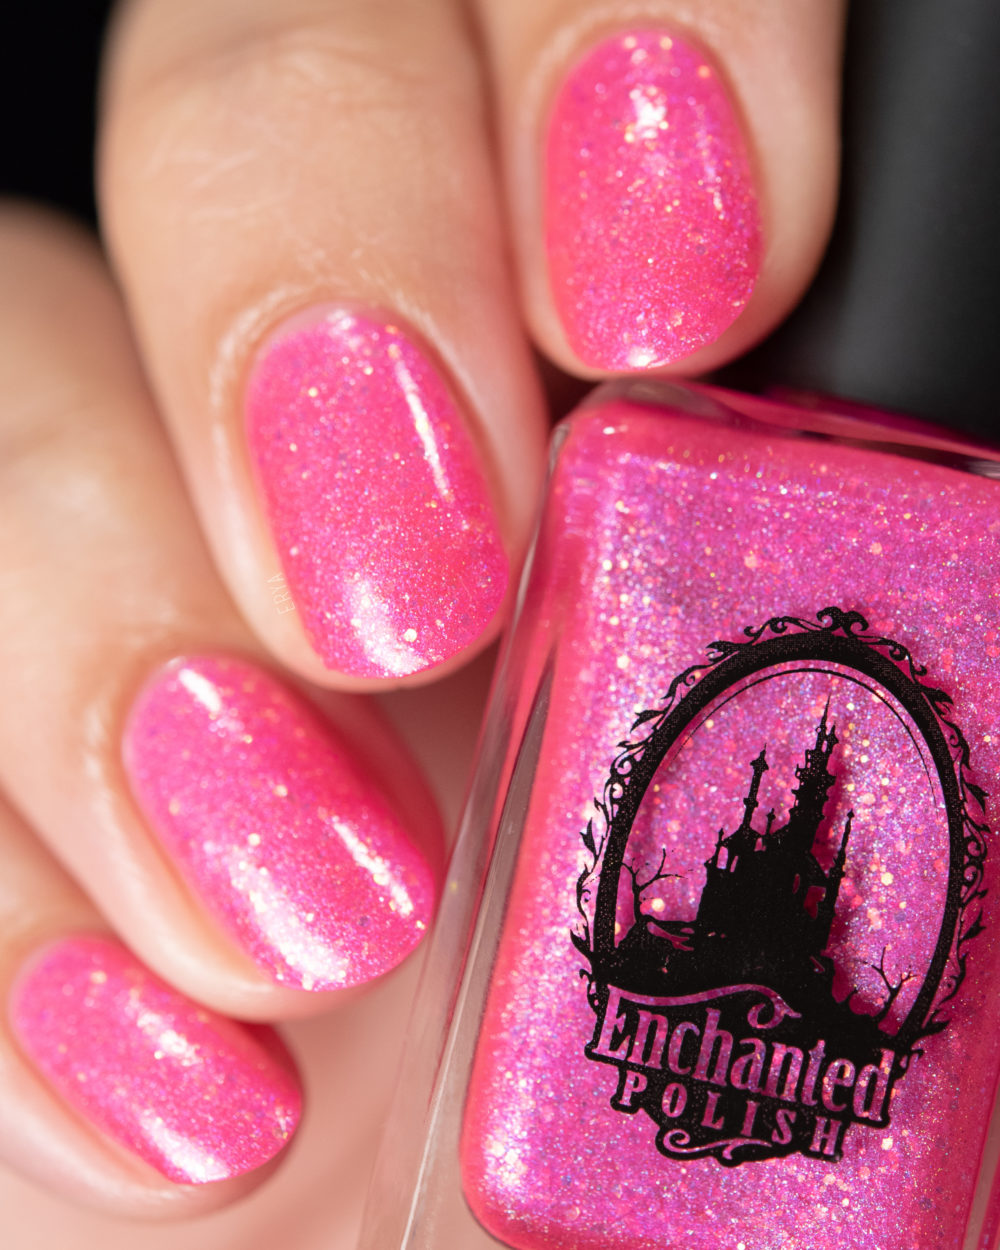 Enchanted_Polish-Opalicious-3